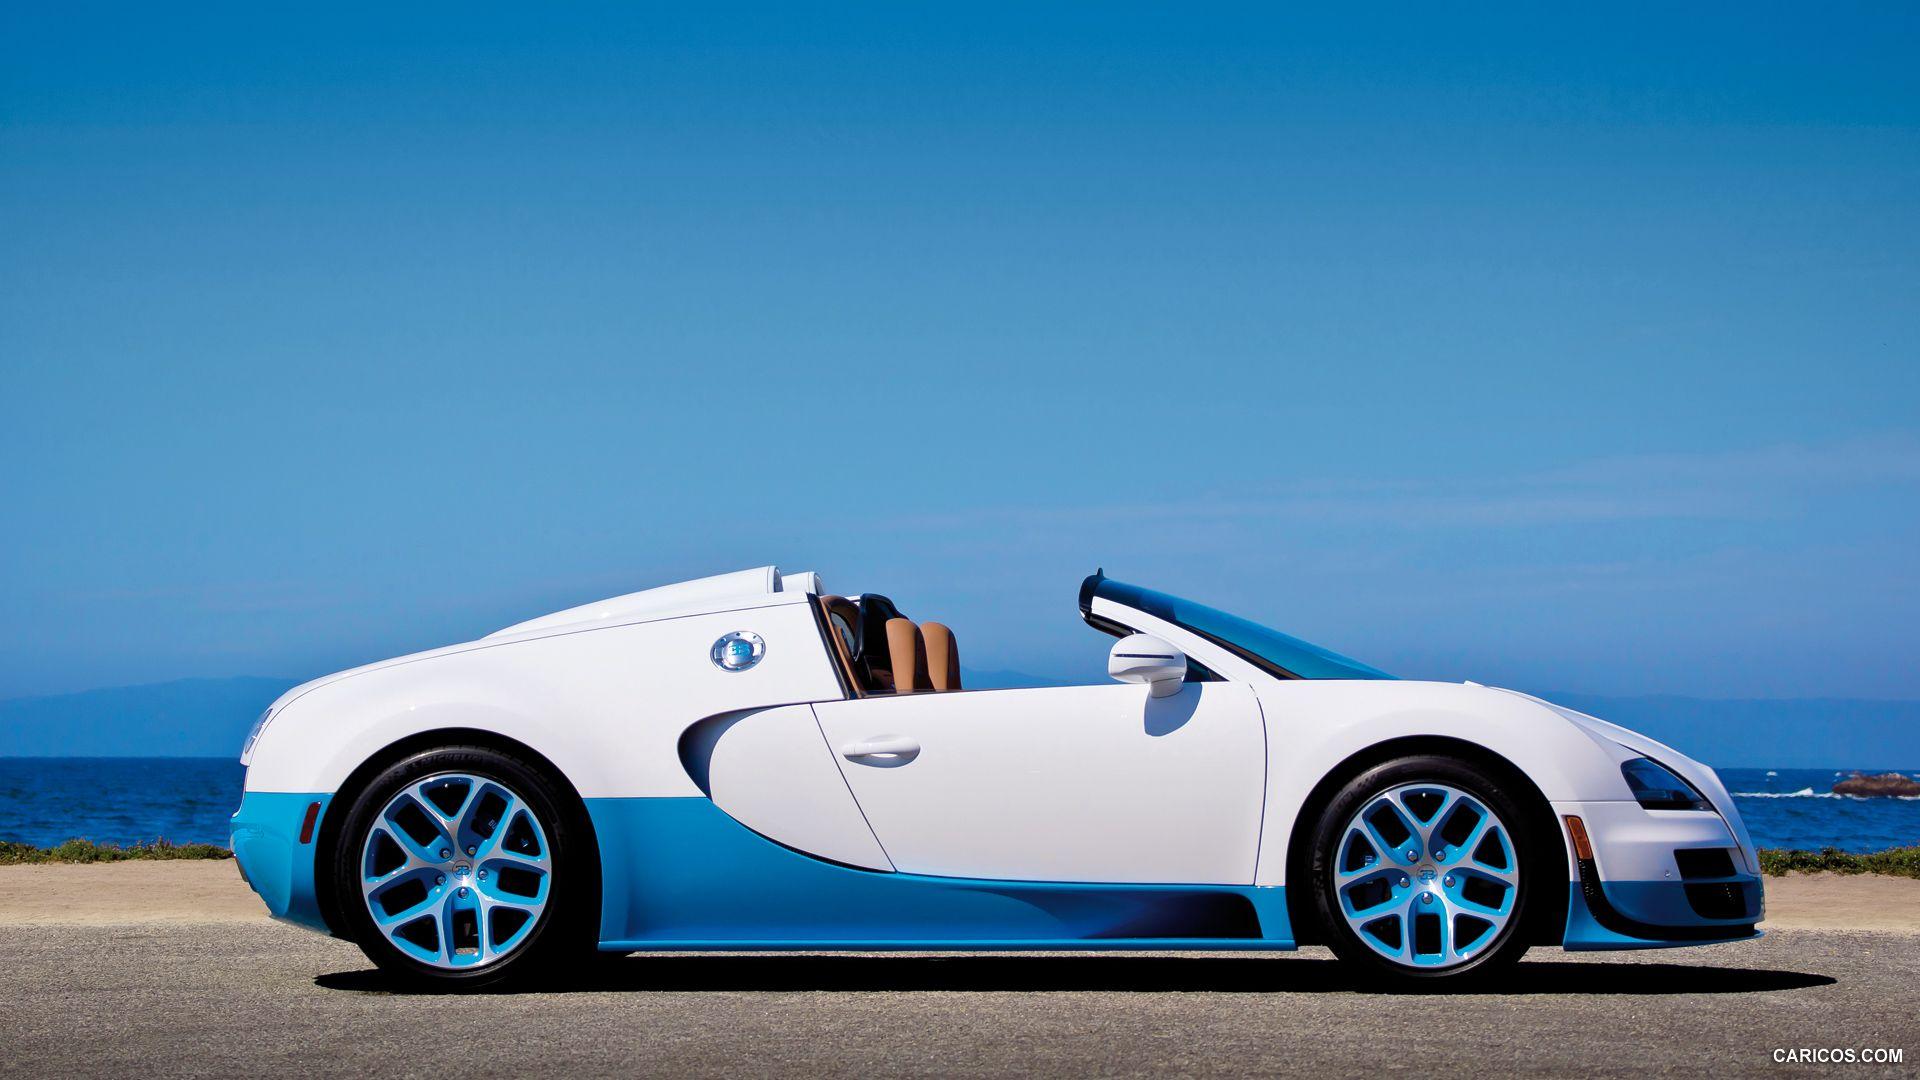 579f13fa17e02fd3de1fafc377505526 Astounding Xe Bugatti Veyron Grand Sport Vitesse Cars Trend